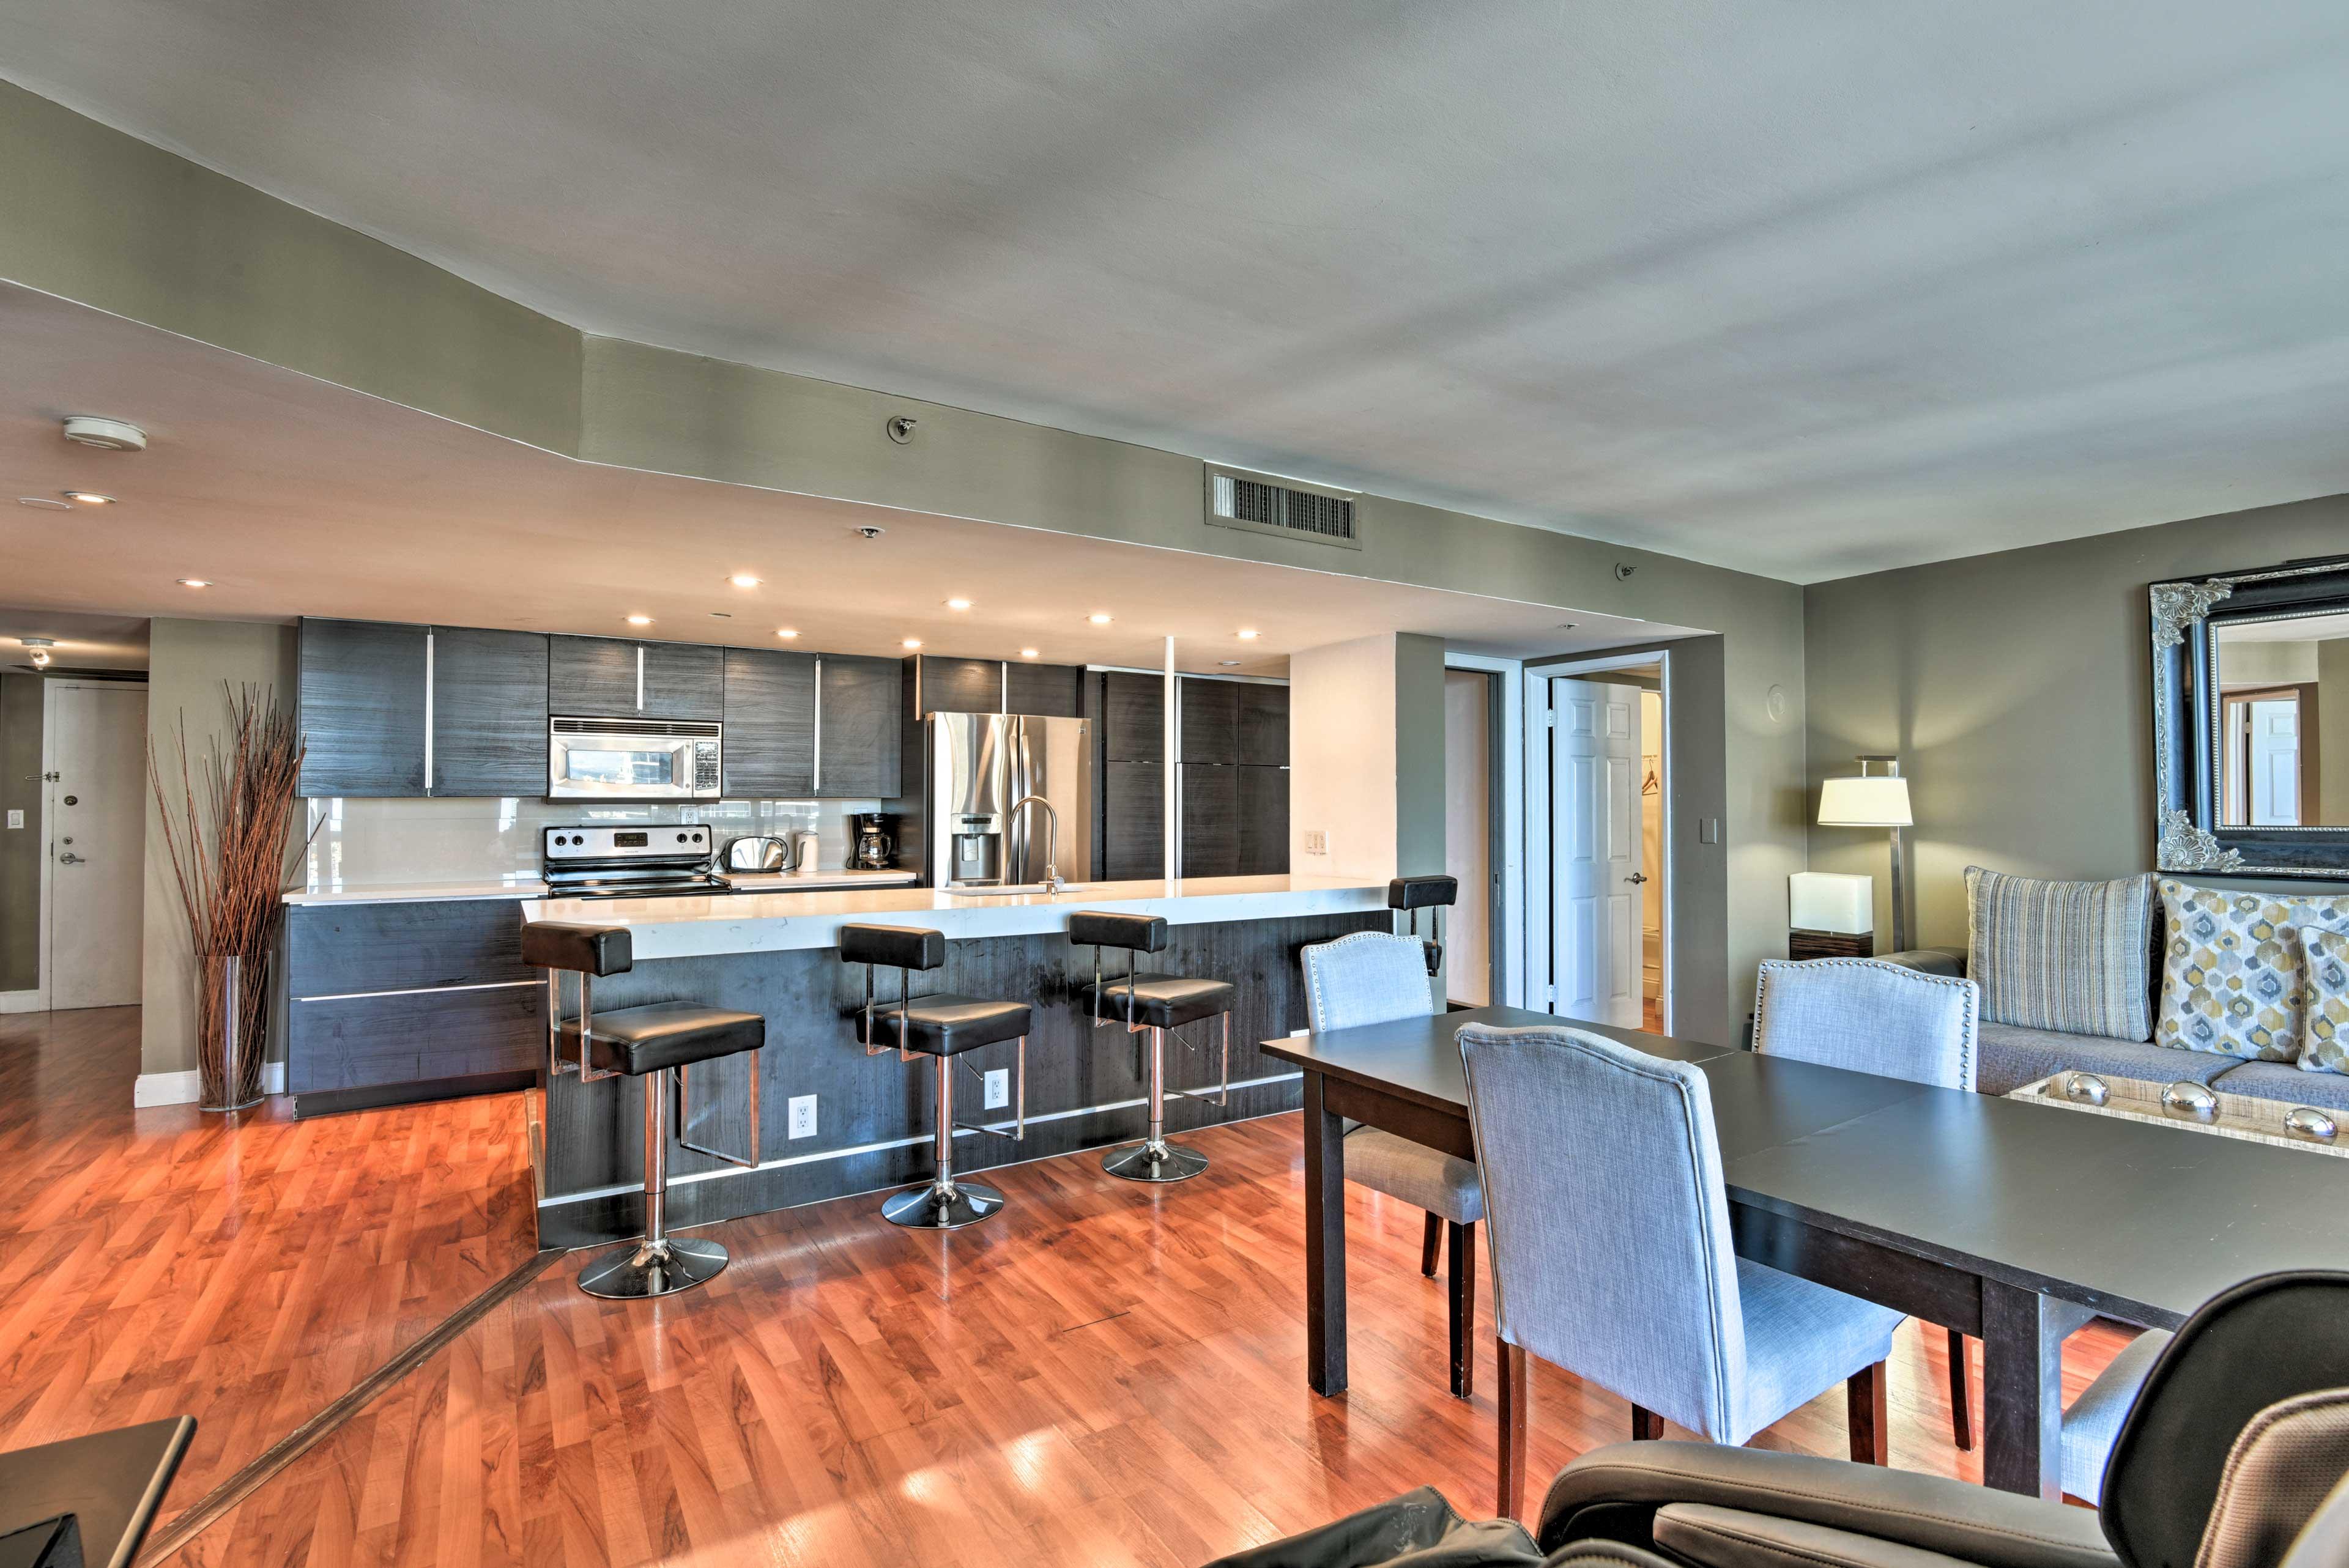 The penthouse boasts hardwood flooring and plenty of modern accents.